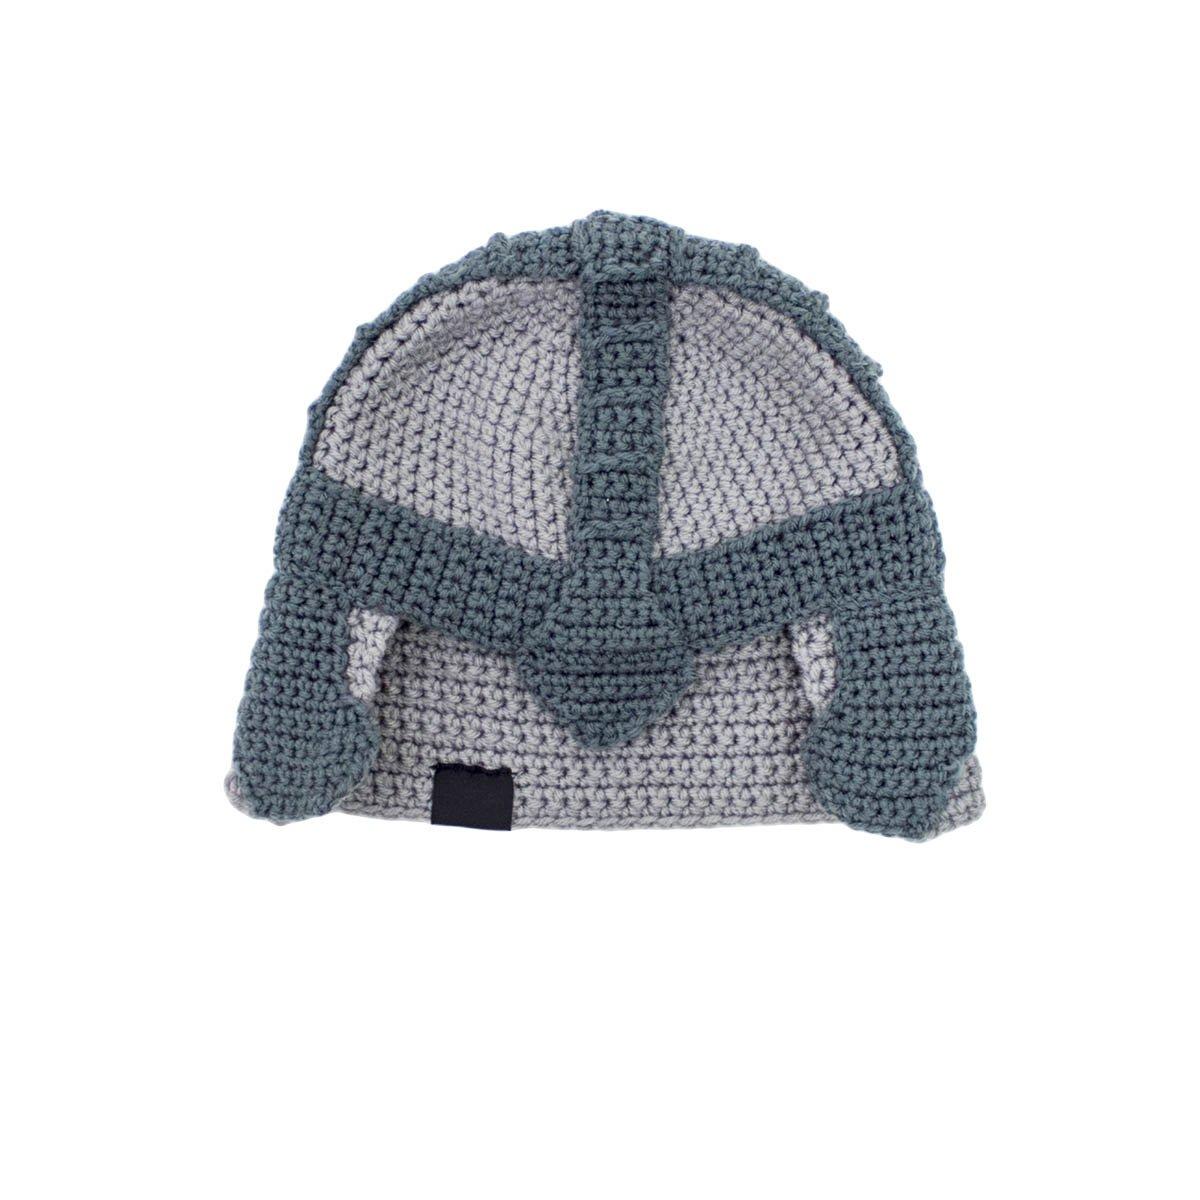 89bd0f120e4 Amazon.com  Beard Head Dwarf Warrior Beard Beanie - Epic Knit Dwarf Helmet  and Fake Beard Black  Clothing